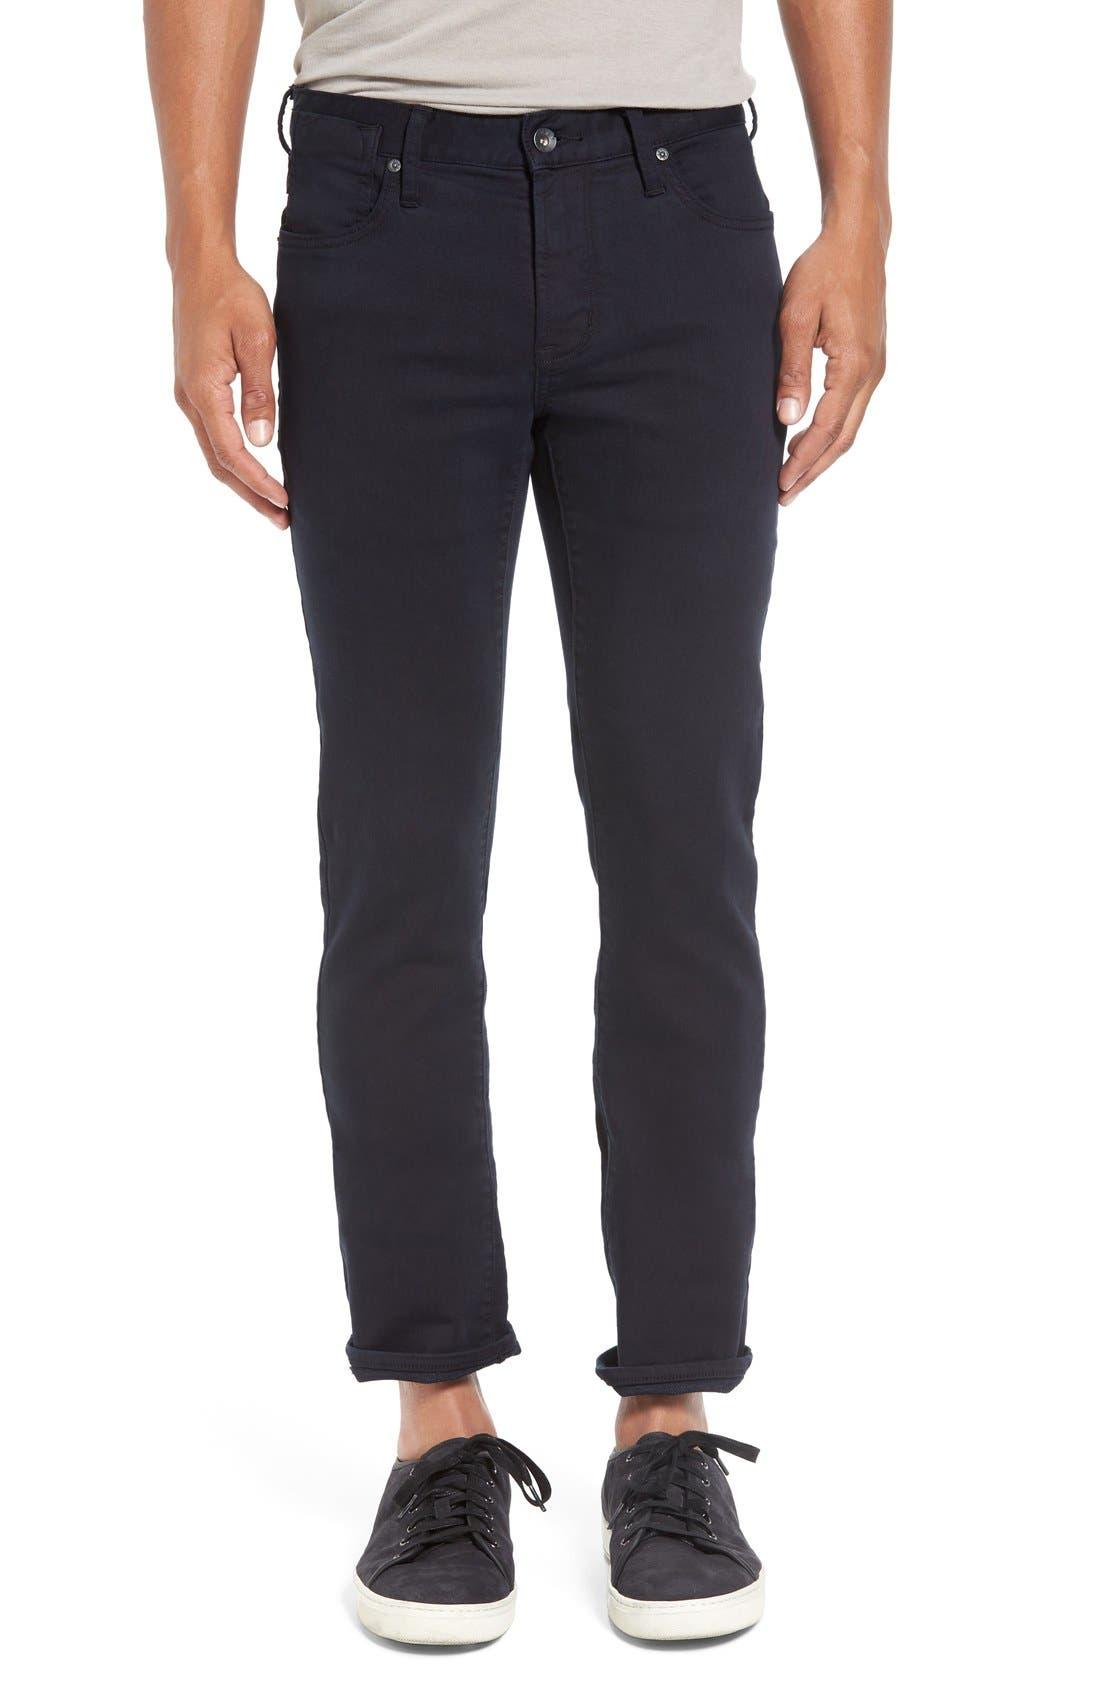 'Bowery' Slim Fit Pants,                         Main,                         color, Eclipse